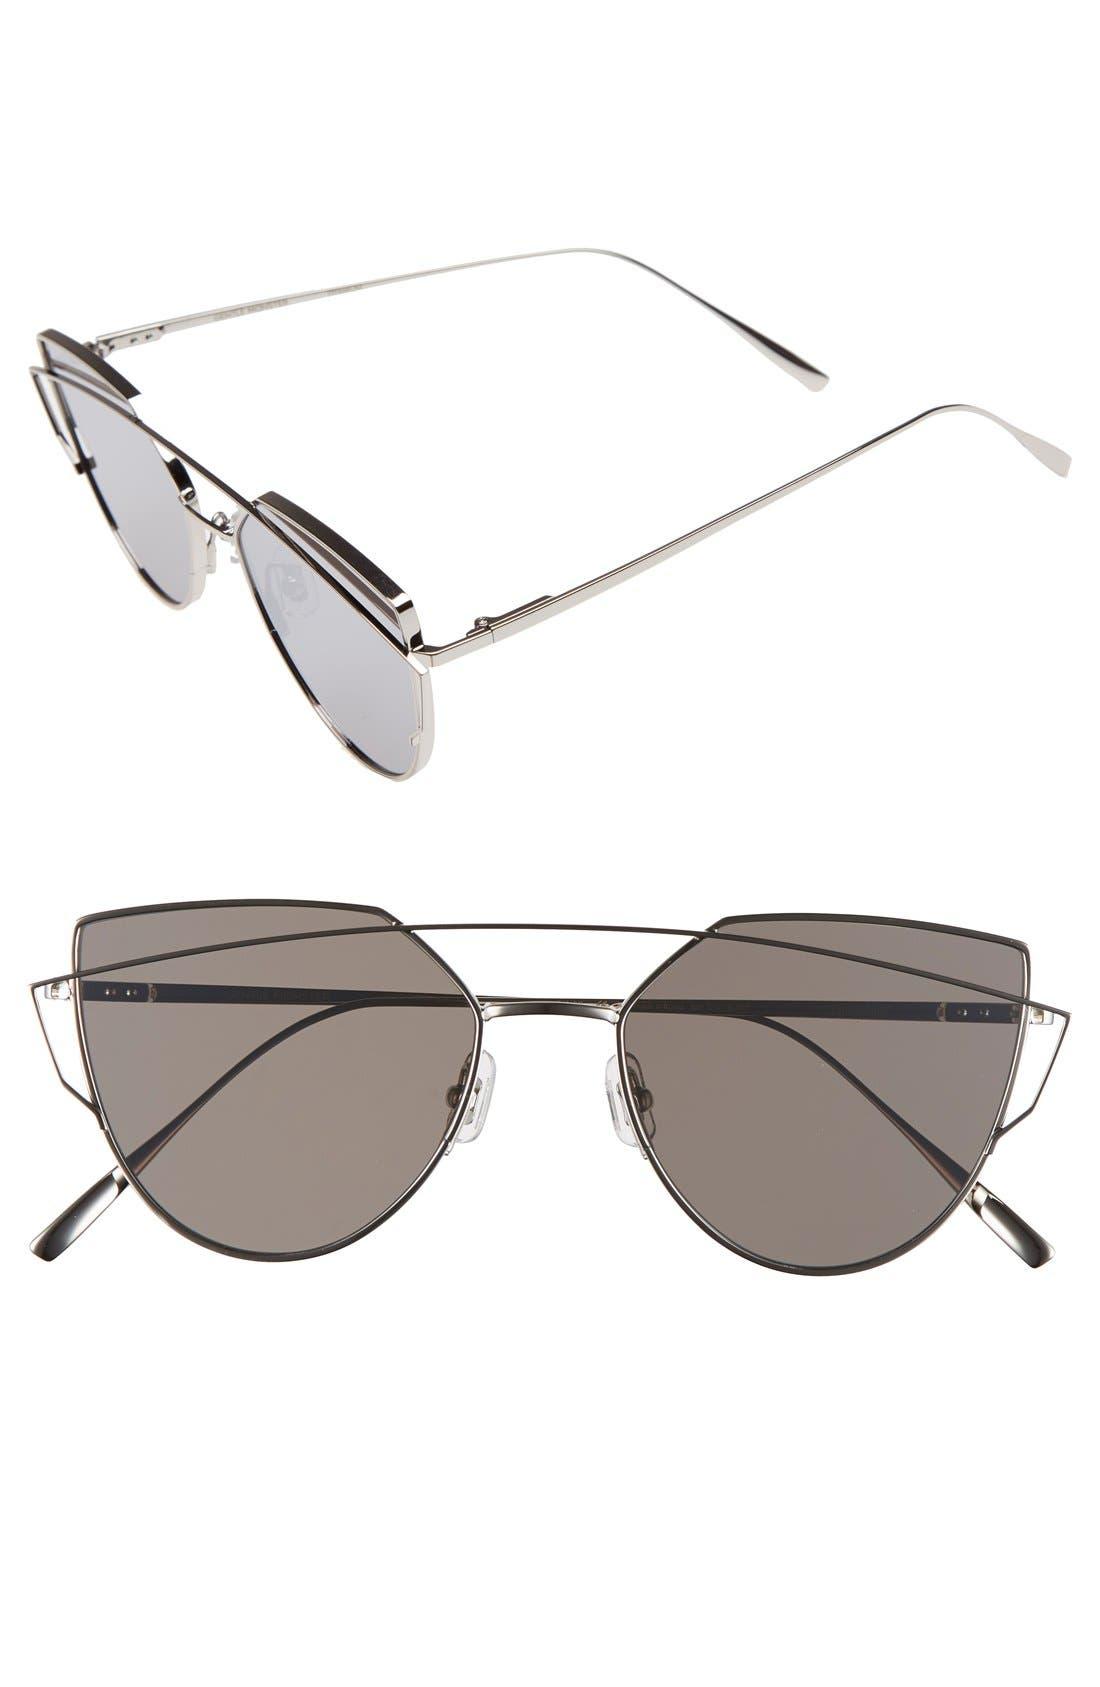 'Love Punch' 55mm Titanium Aviator Sunglasses,                             Main thumbnail 1, color,                             040